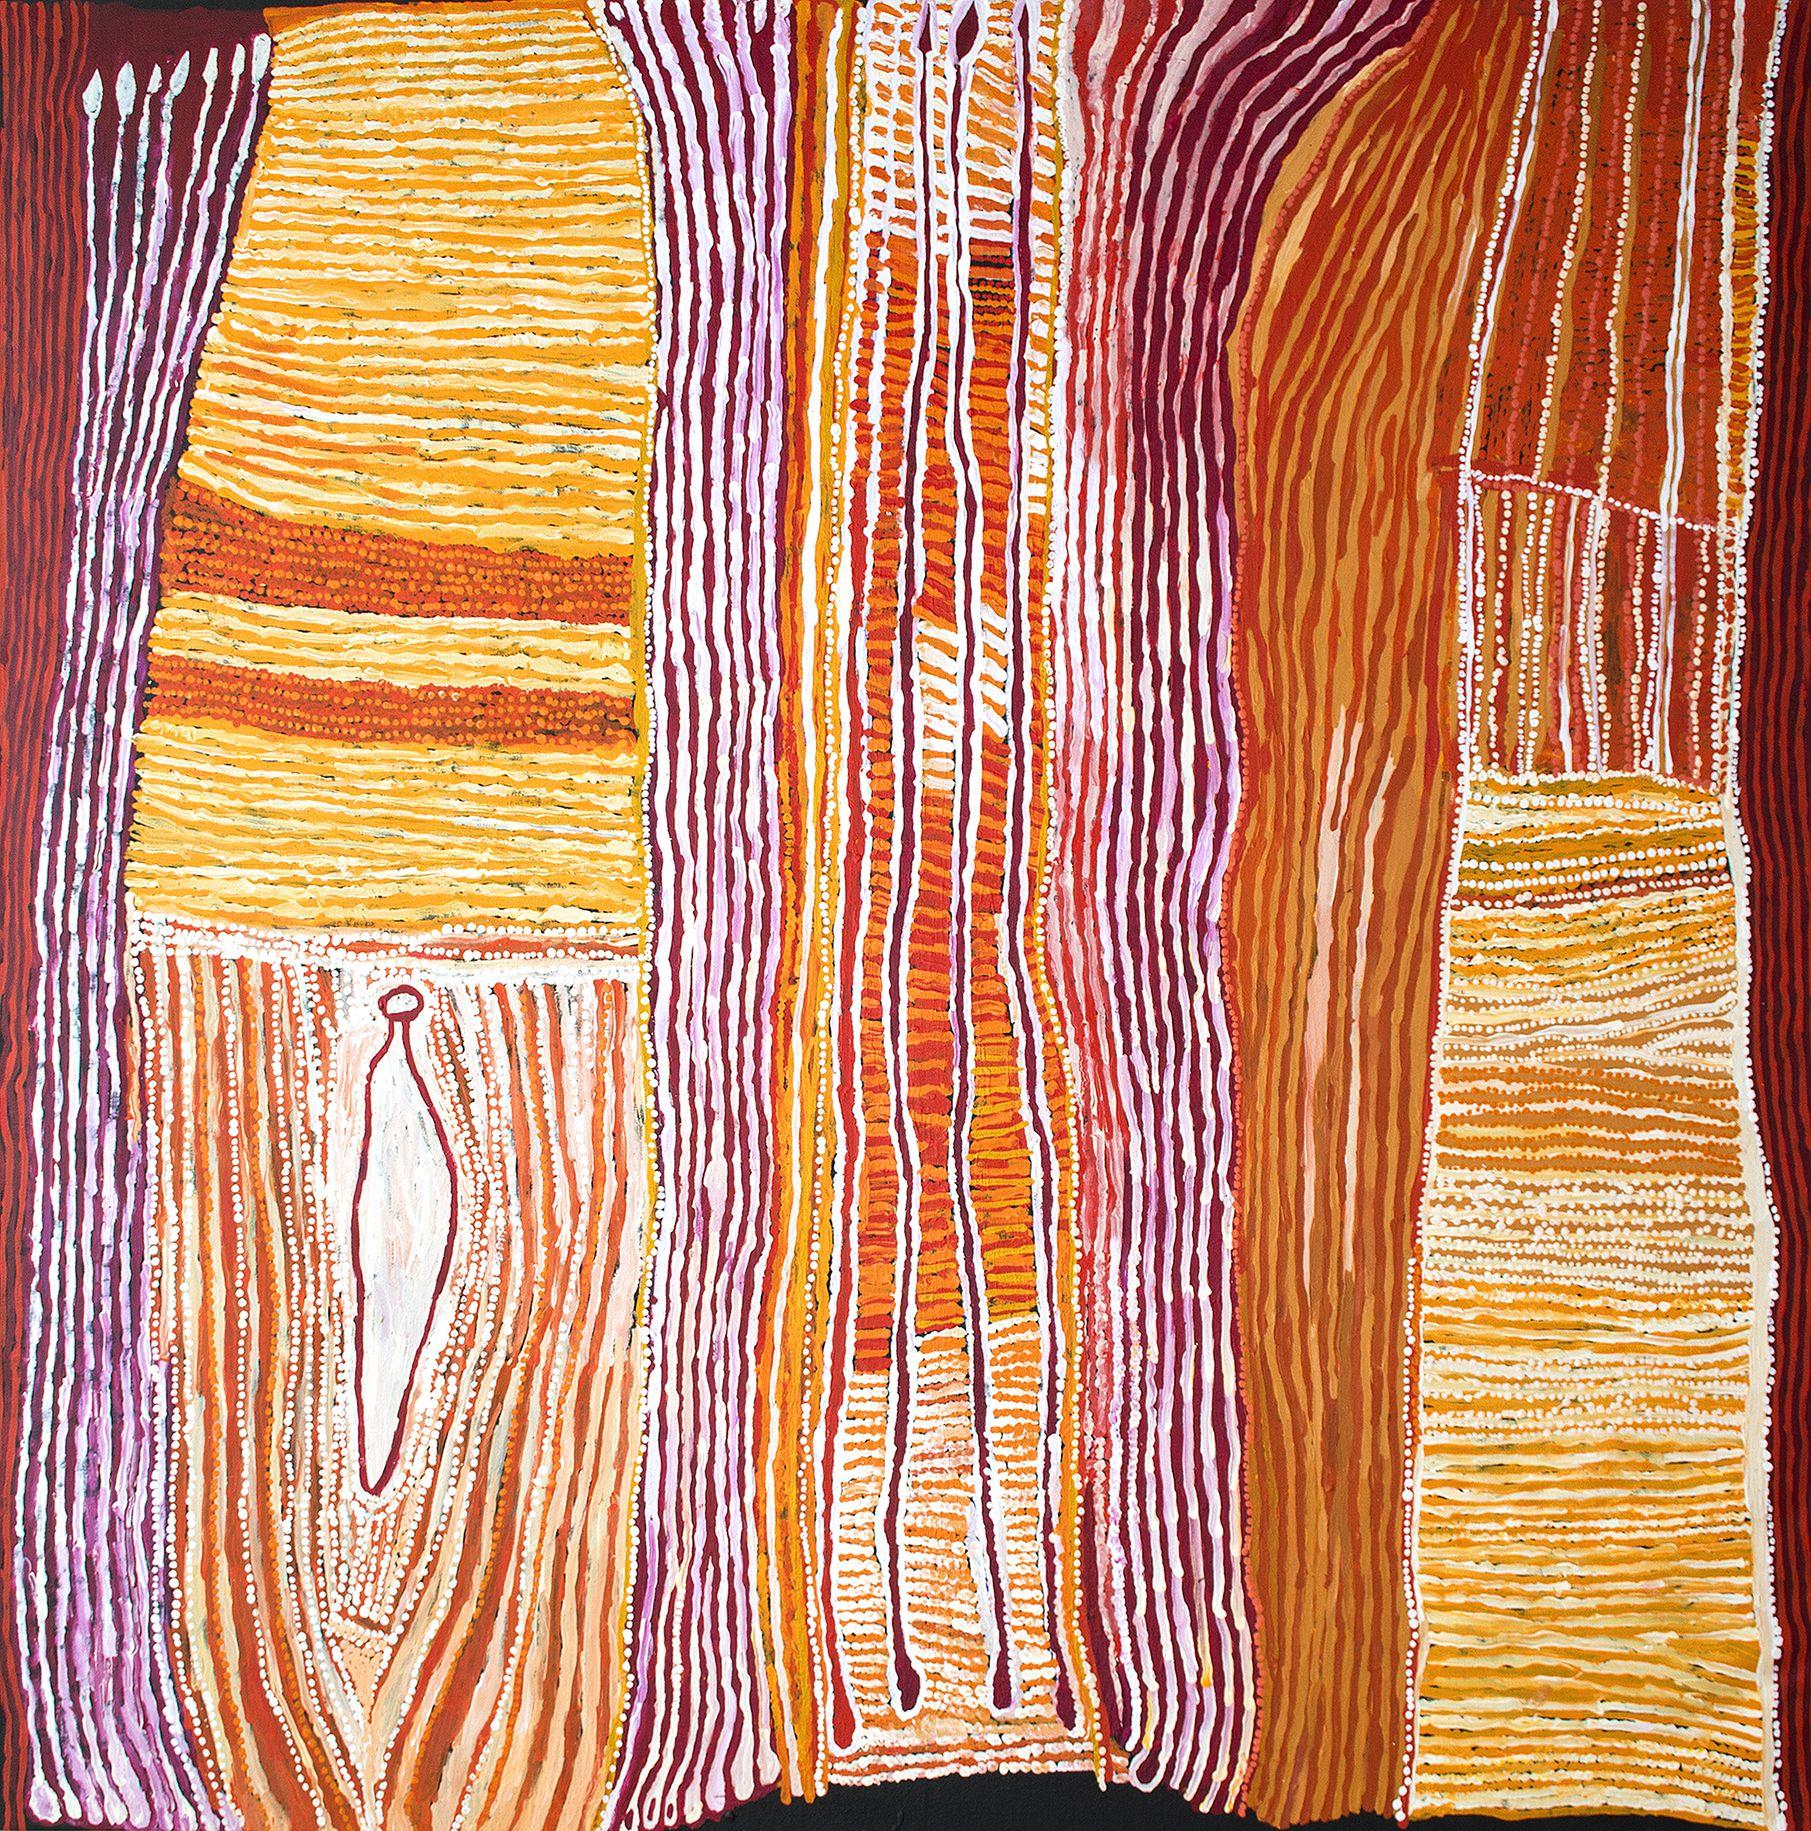 Œuvre magistrale de l'artiste Ray Ken de Tjala Arts. Titre : Kulata Tjuta and Sand hills. Format : 200 x 200 cm. © Photo Aboriginal Signature Estrangin gallery with the courtesy of the artist and Tjala Arts.